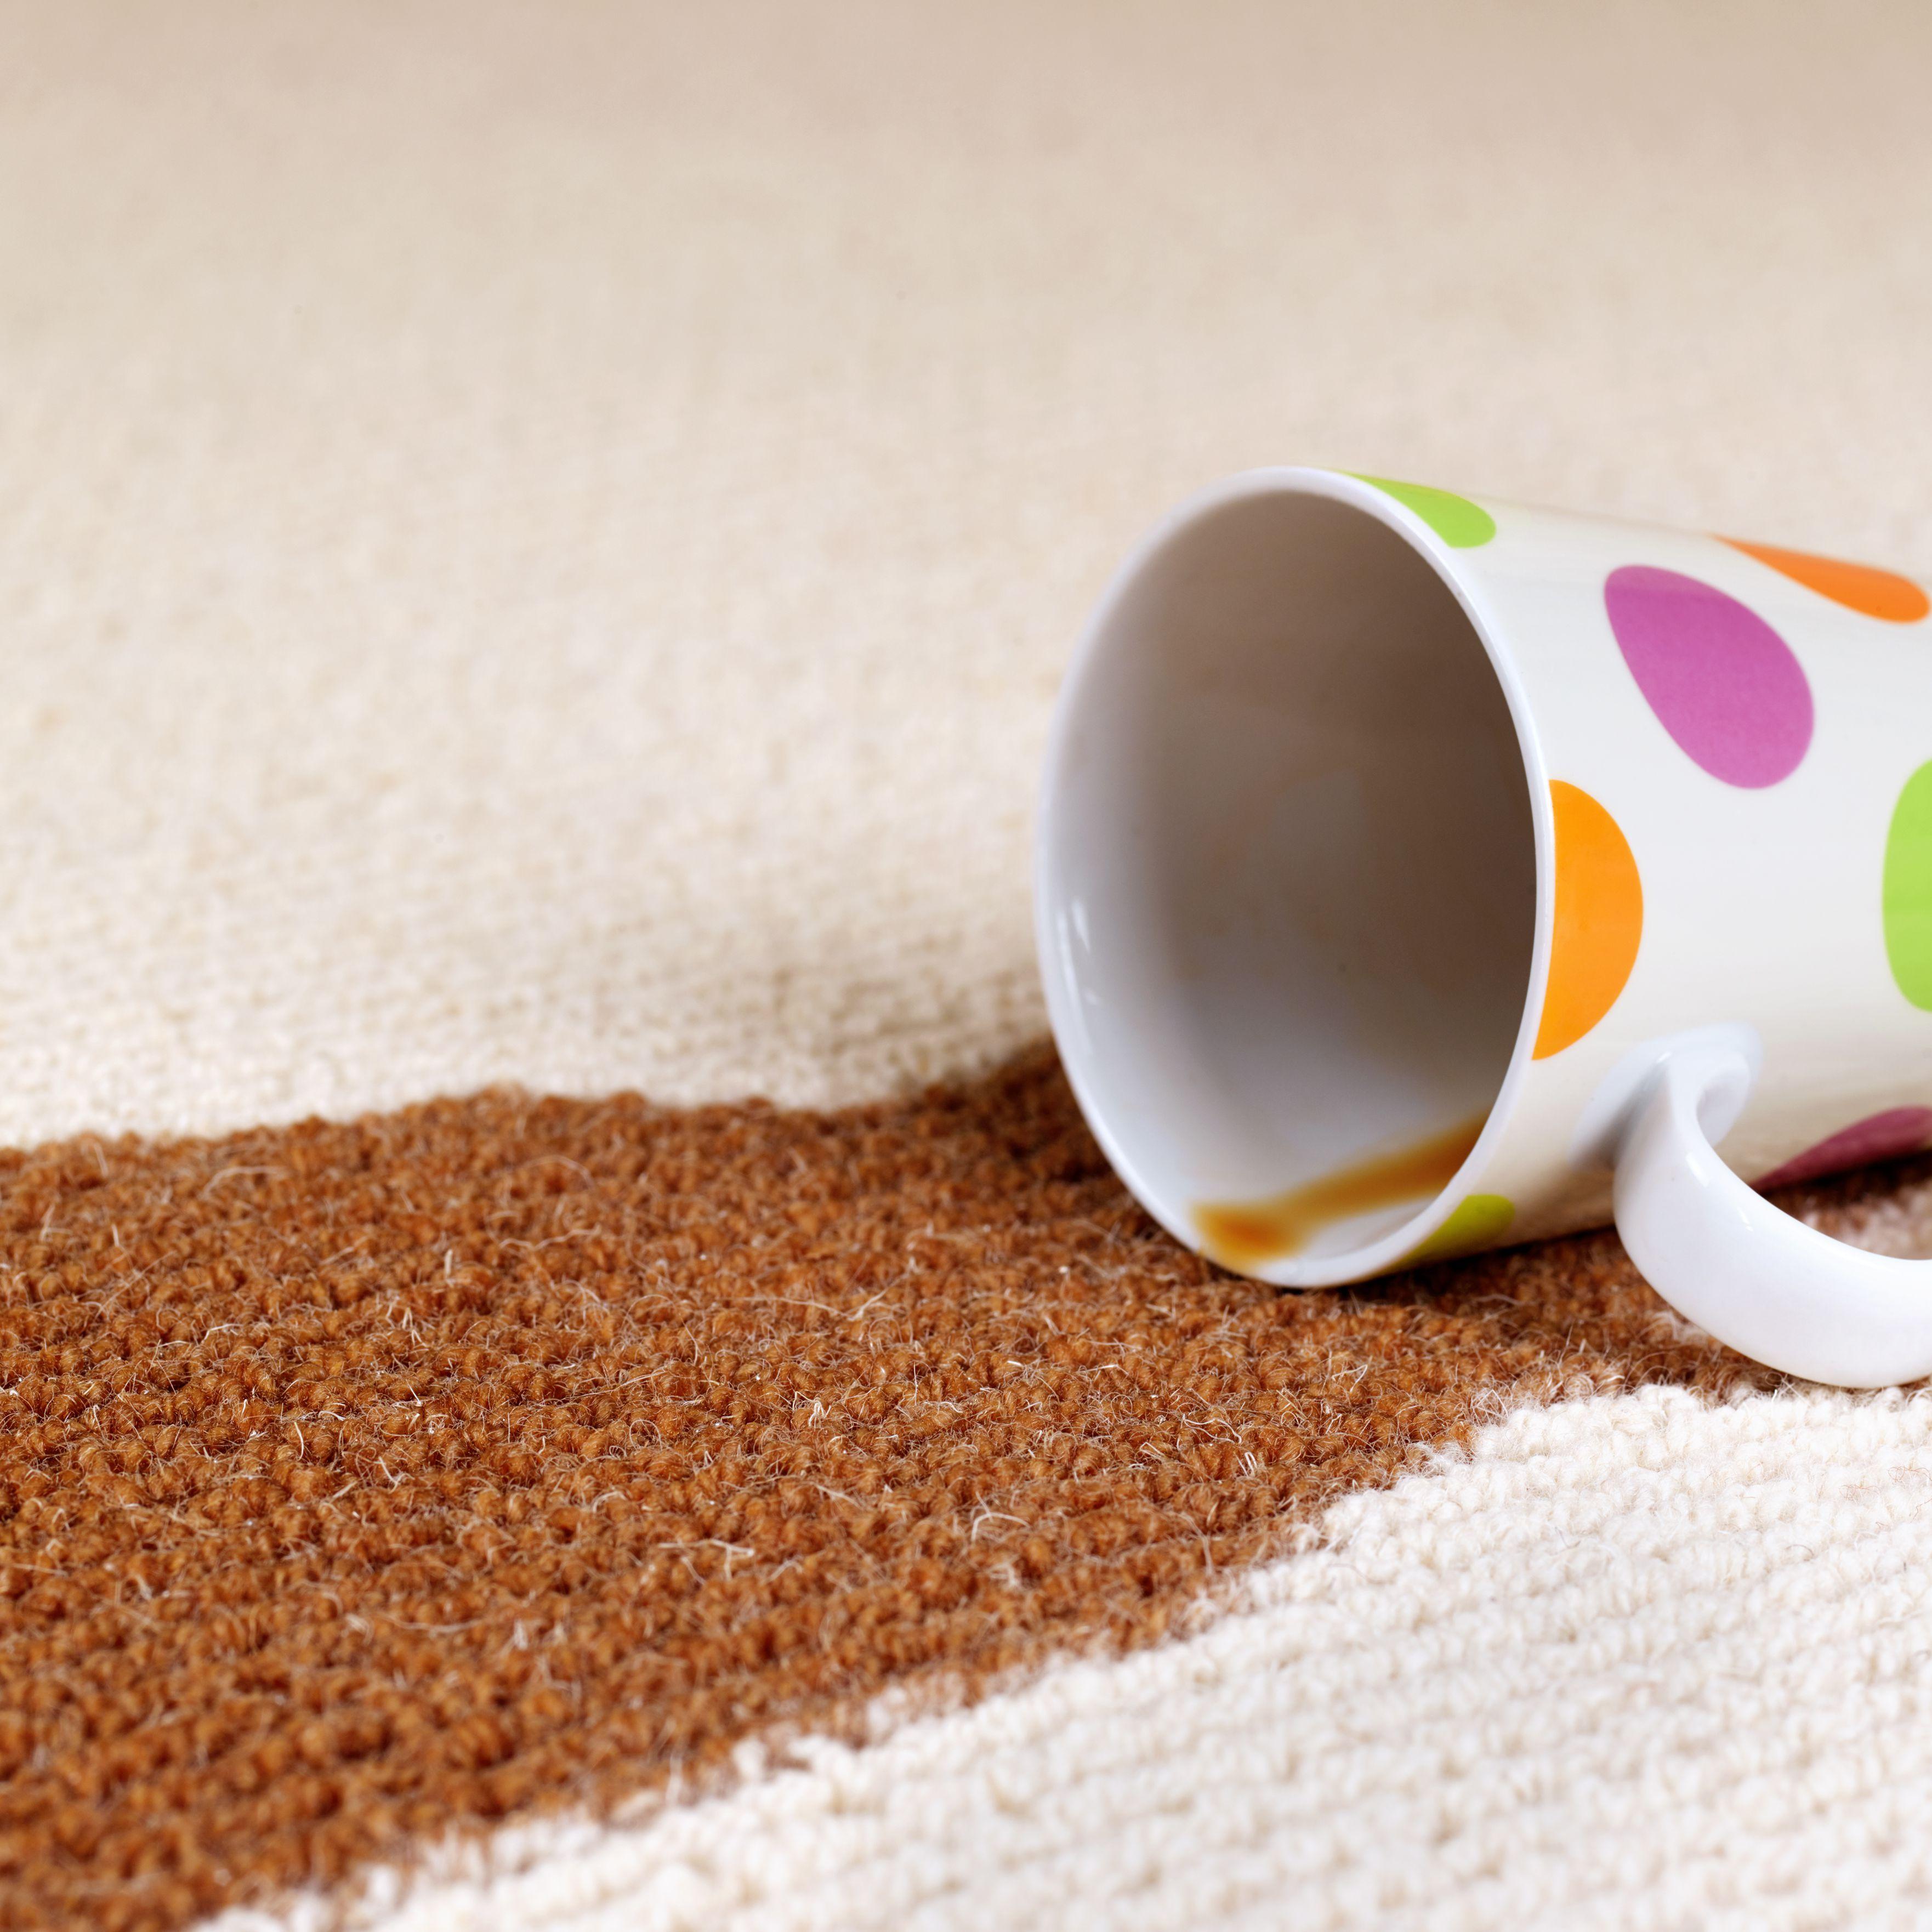 Zep Mercial Carpet Extractor Cleaner Carpet Vidalondon